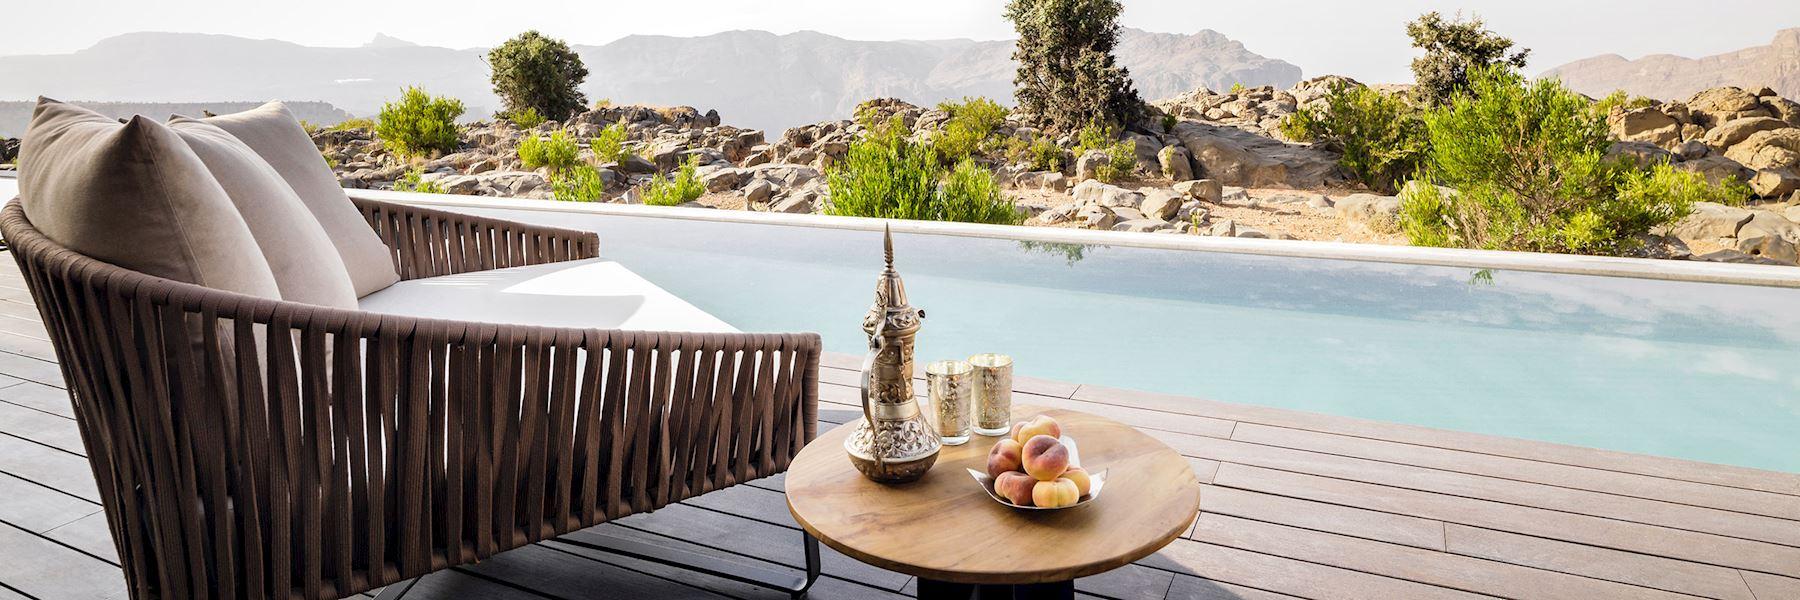 Anantara Al Jabal Al Akhdar Resort